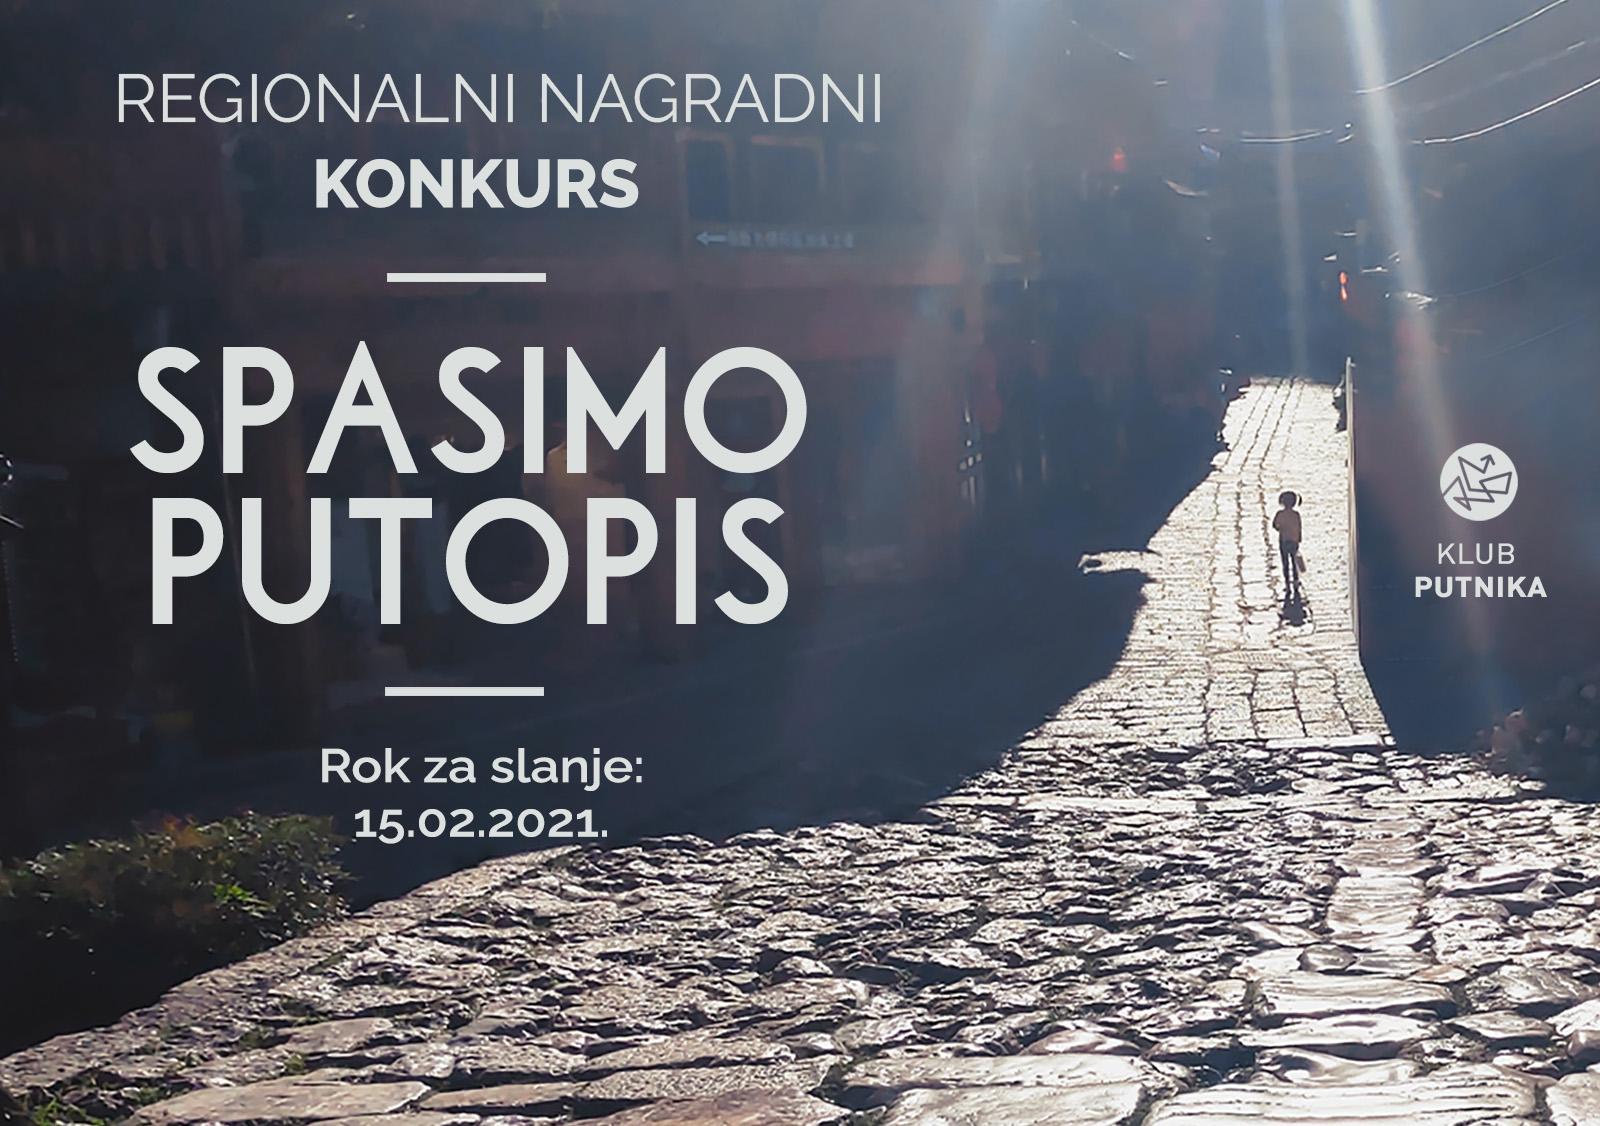 Regionalni nagradni konkurs: Spasimo putopis 2021.